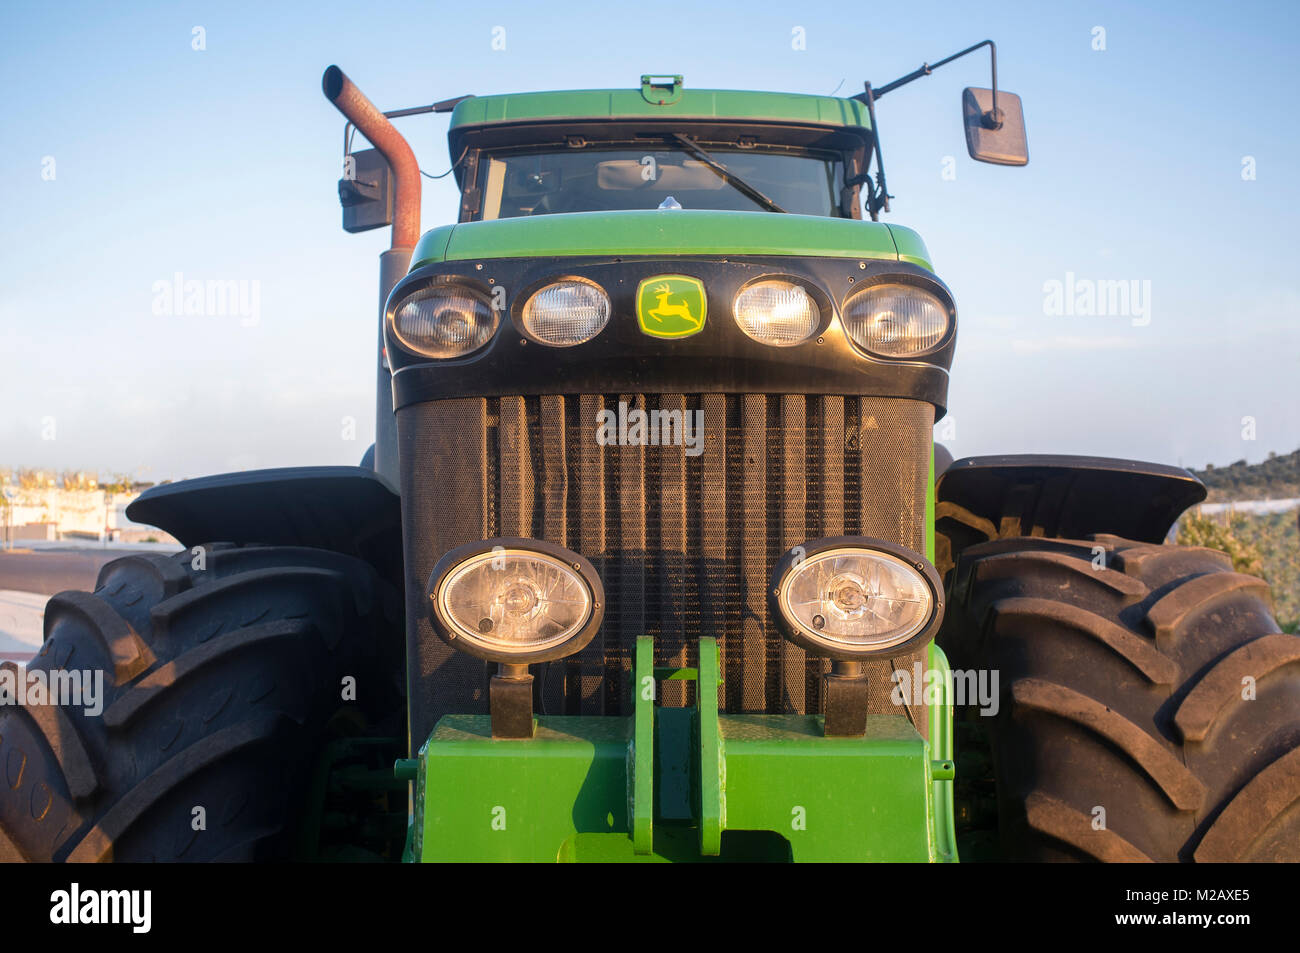 Badajoz, Spain - August 6th, 2017: Row Crop Tractor John Deere 8320. Front view - Stock Image